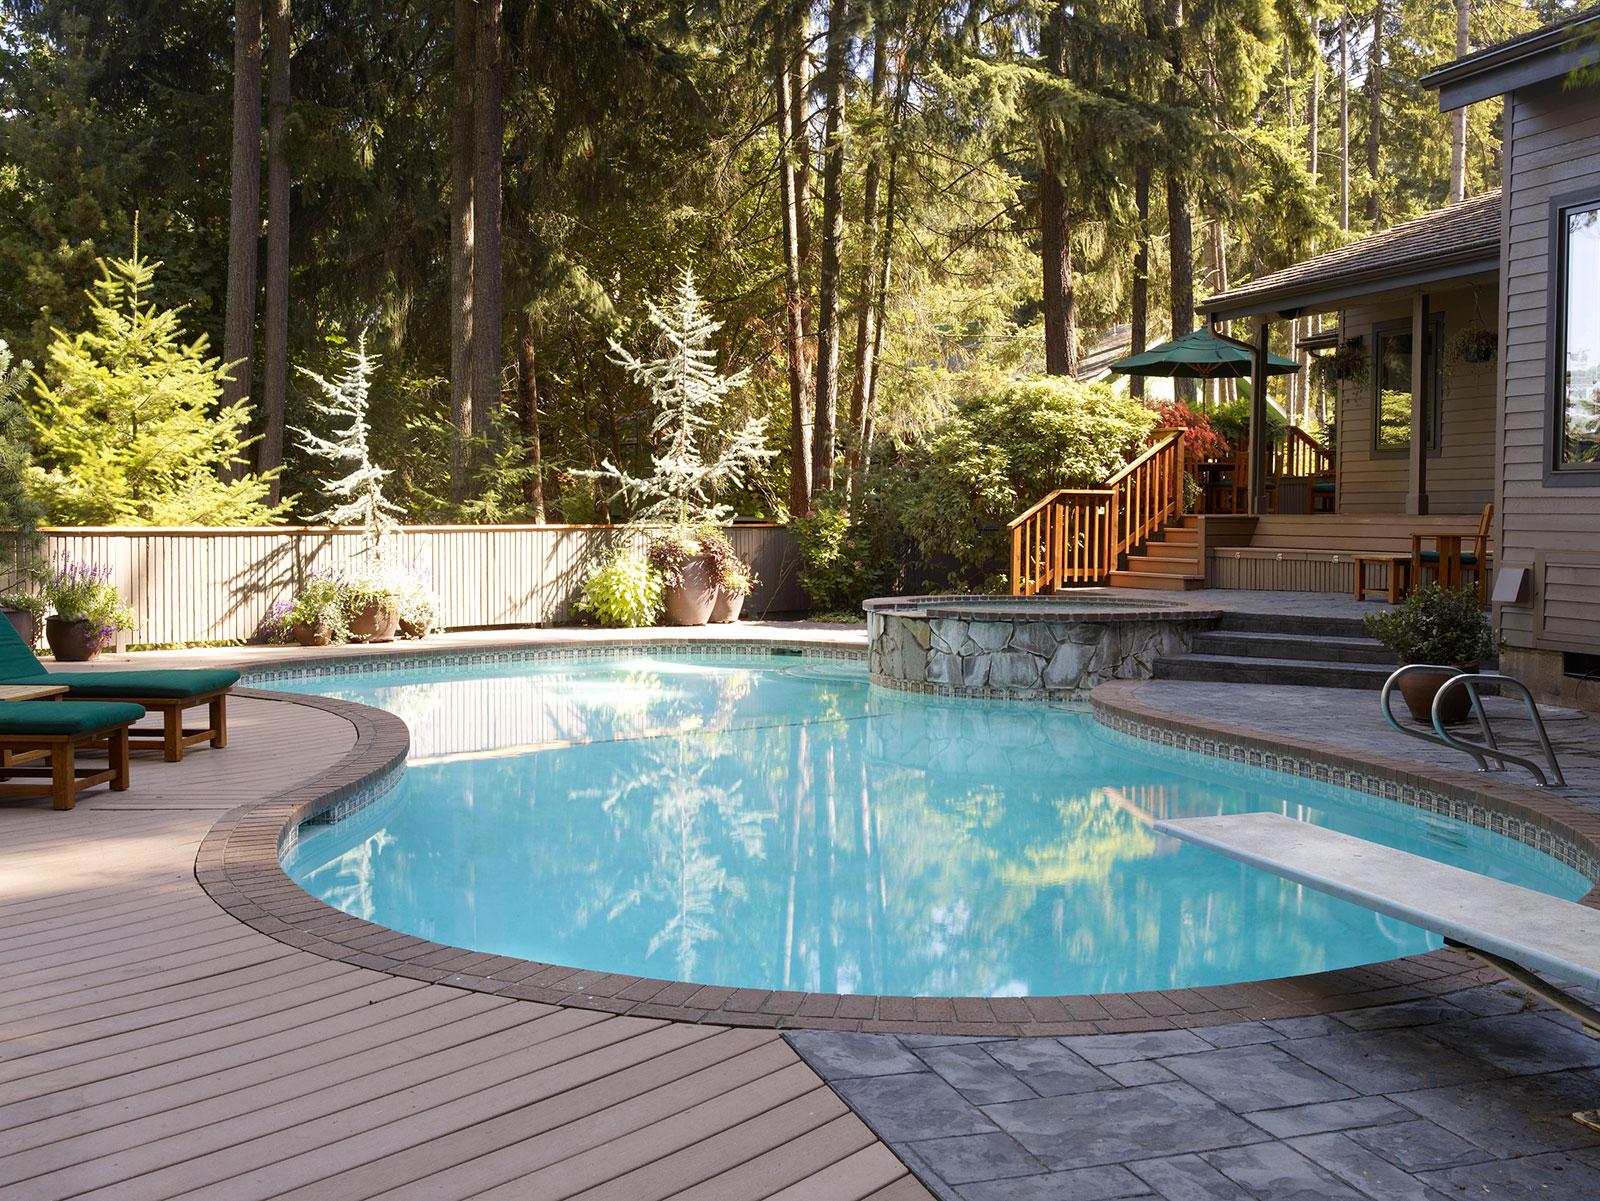 Biglan Pool Deck & Patio Design Eugene